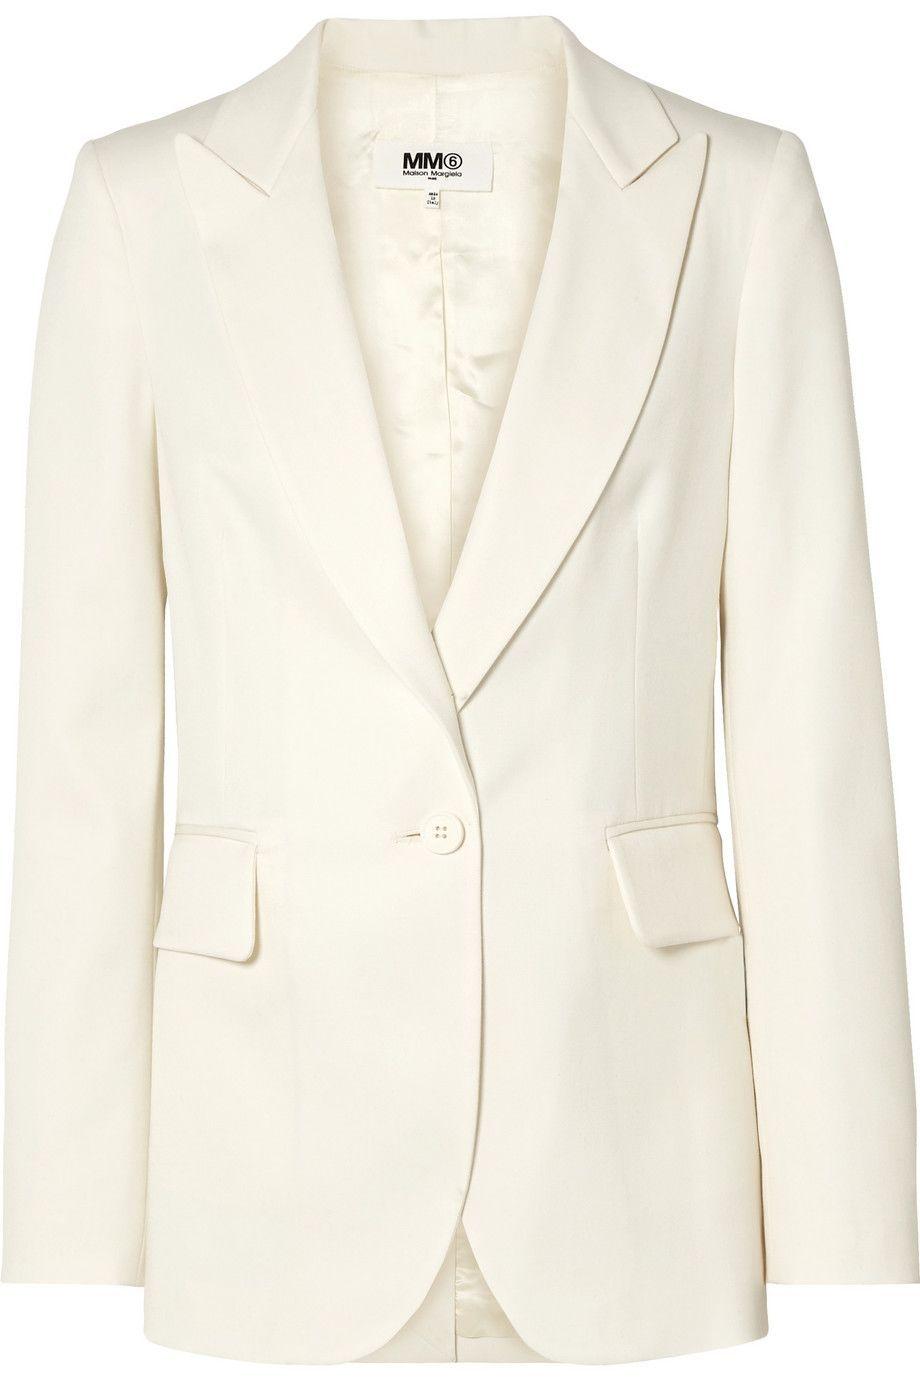 #PopbelaOOTD: Blazer Musim Panas!